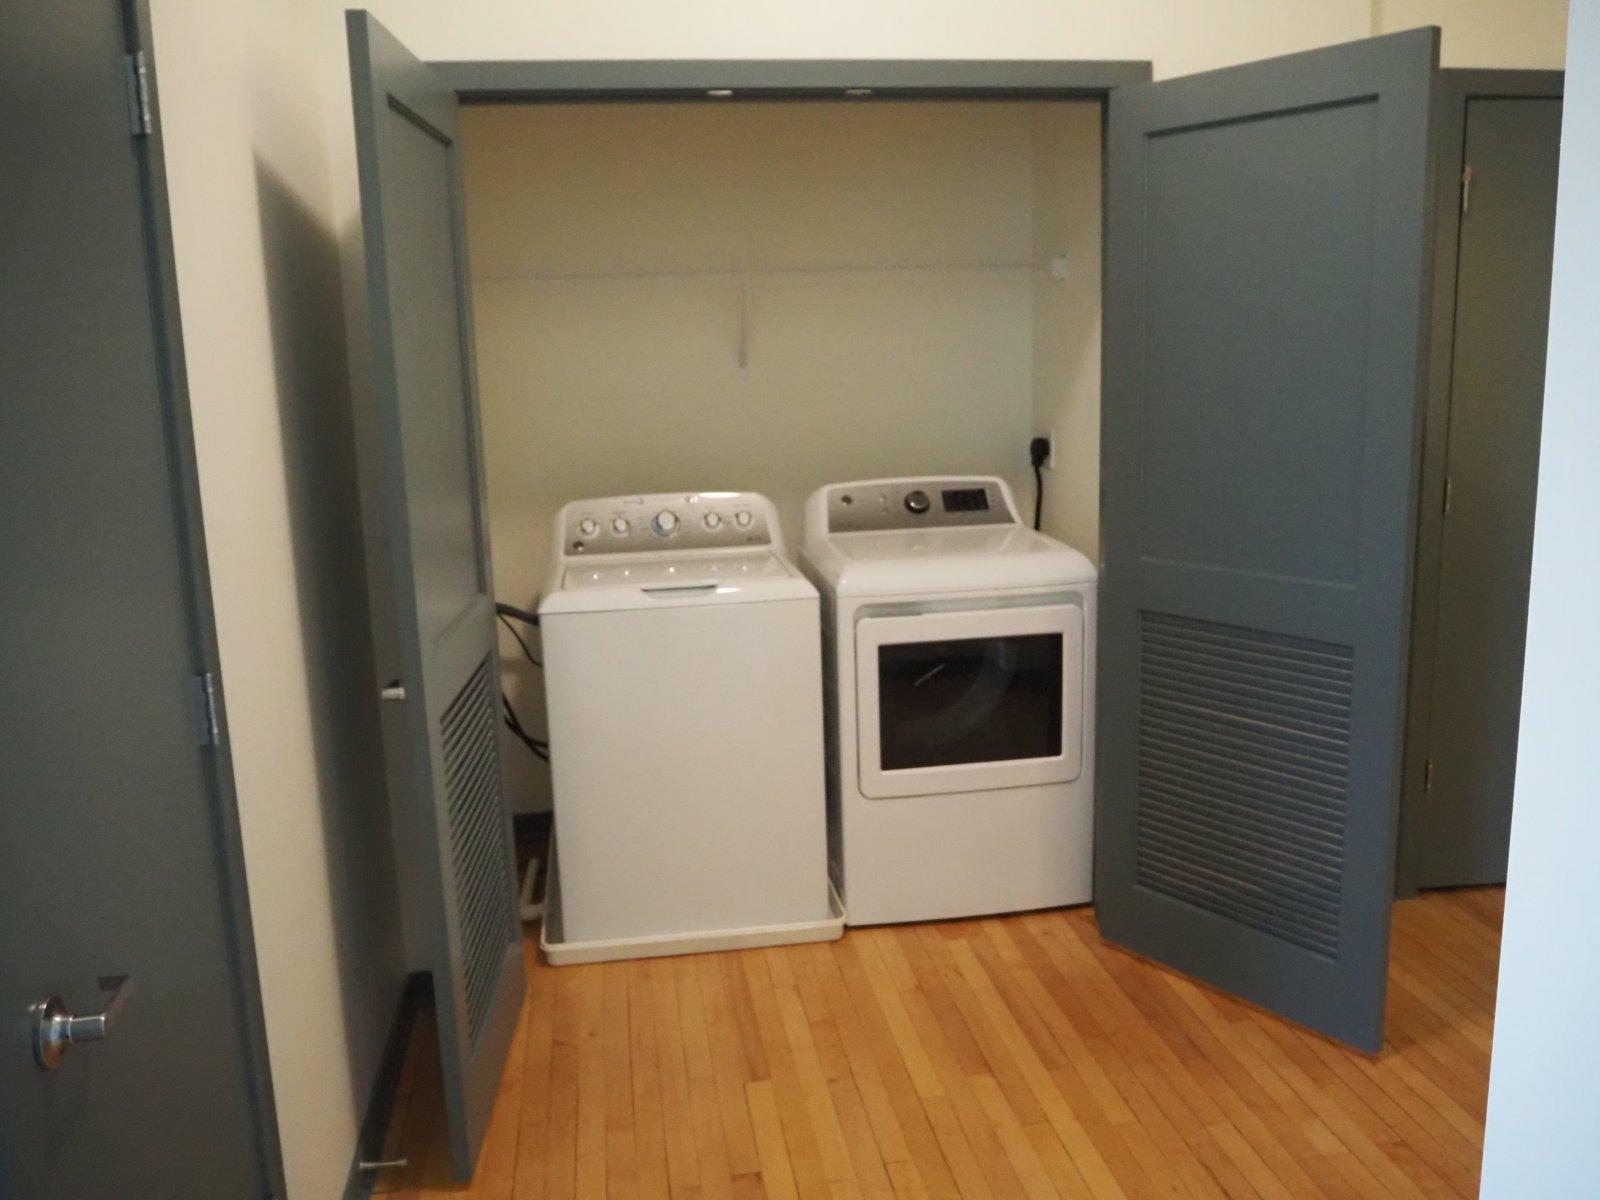 37th Street School Senior Apartments Washer Dryer